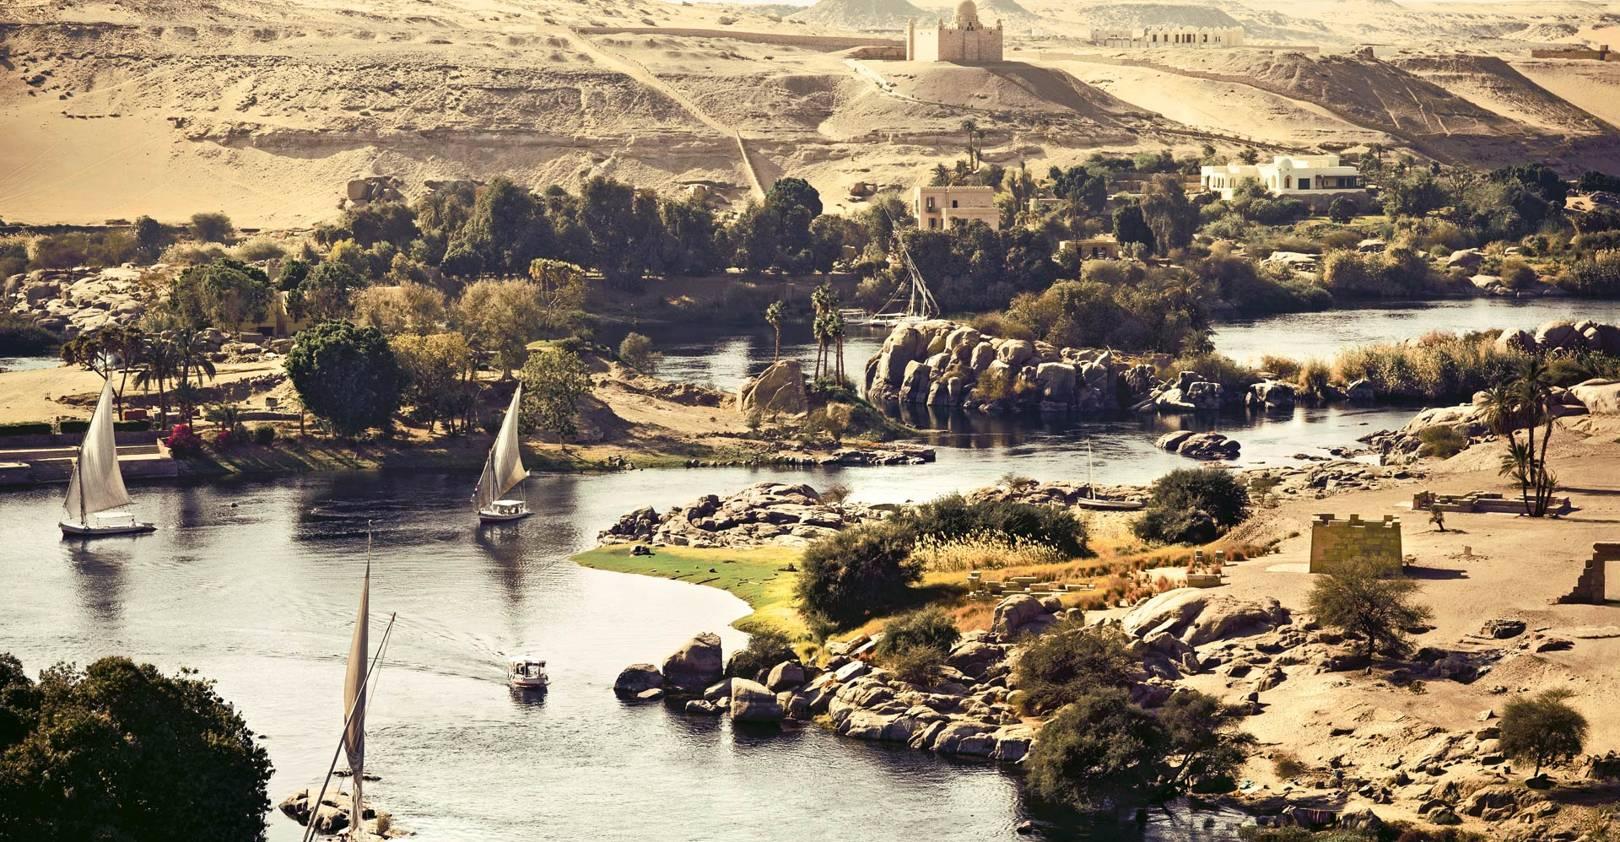 Aswan: the great divide